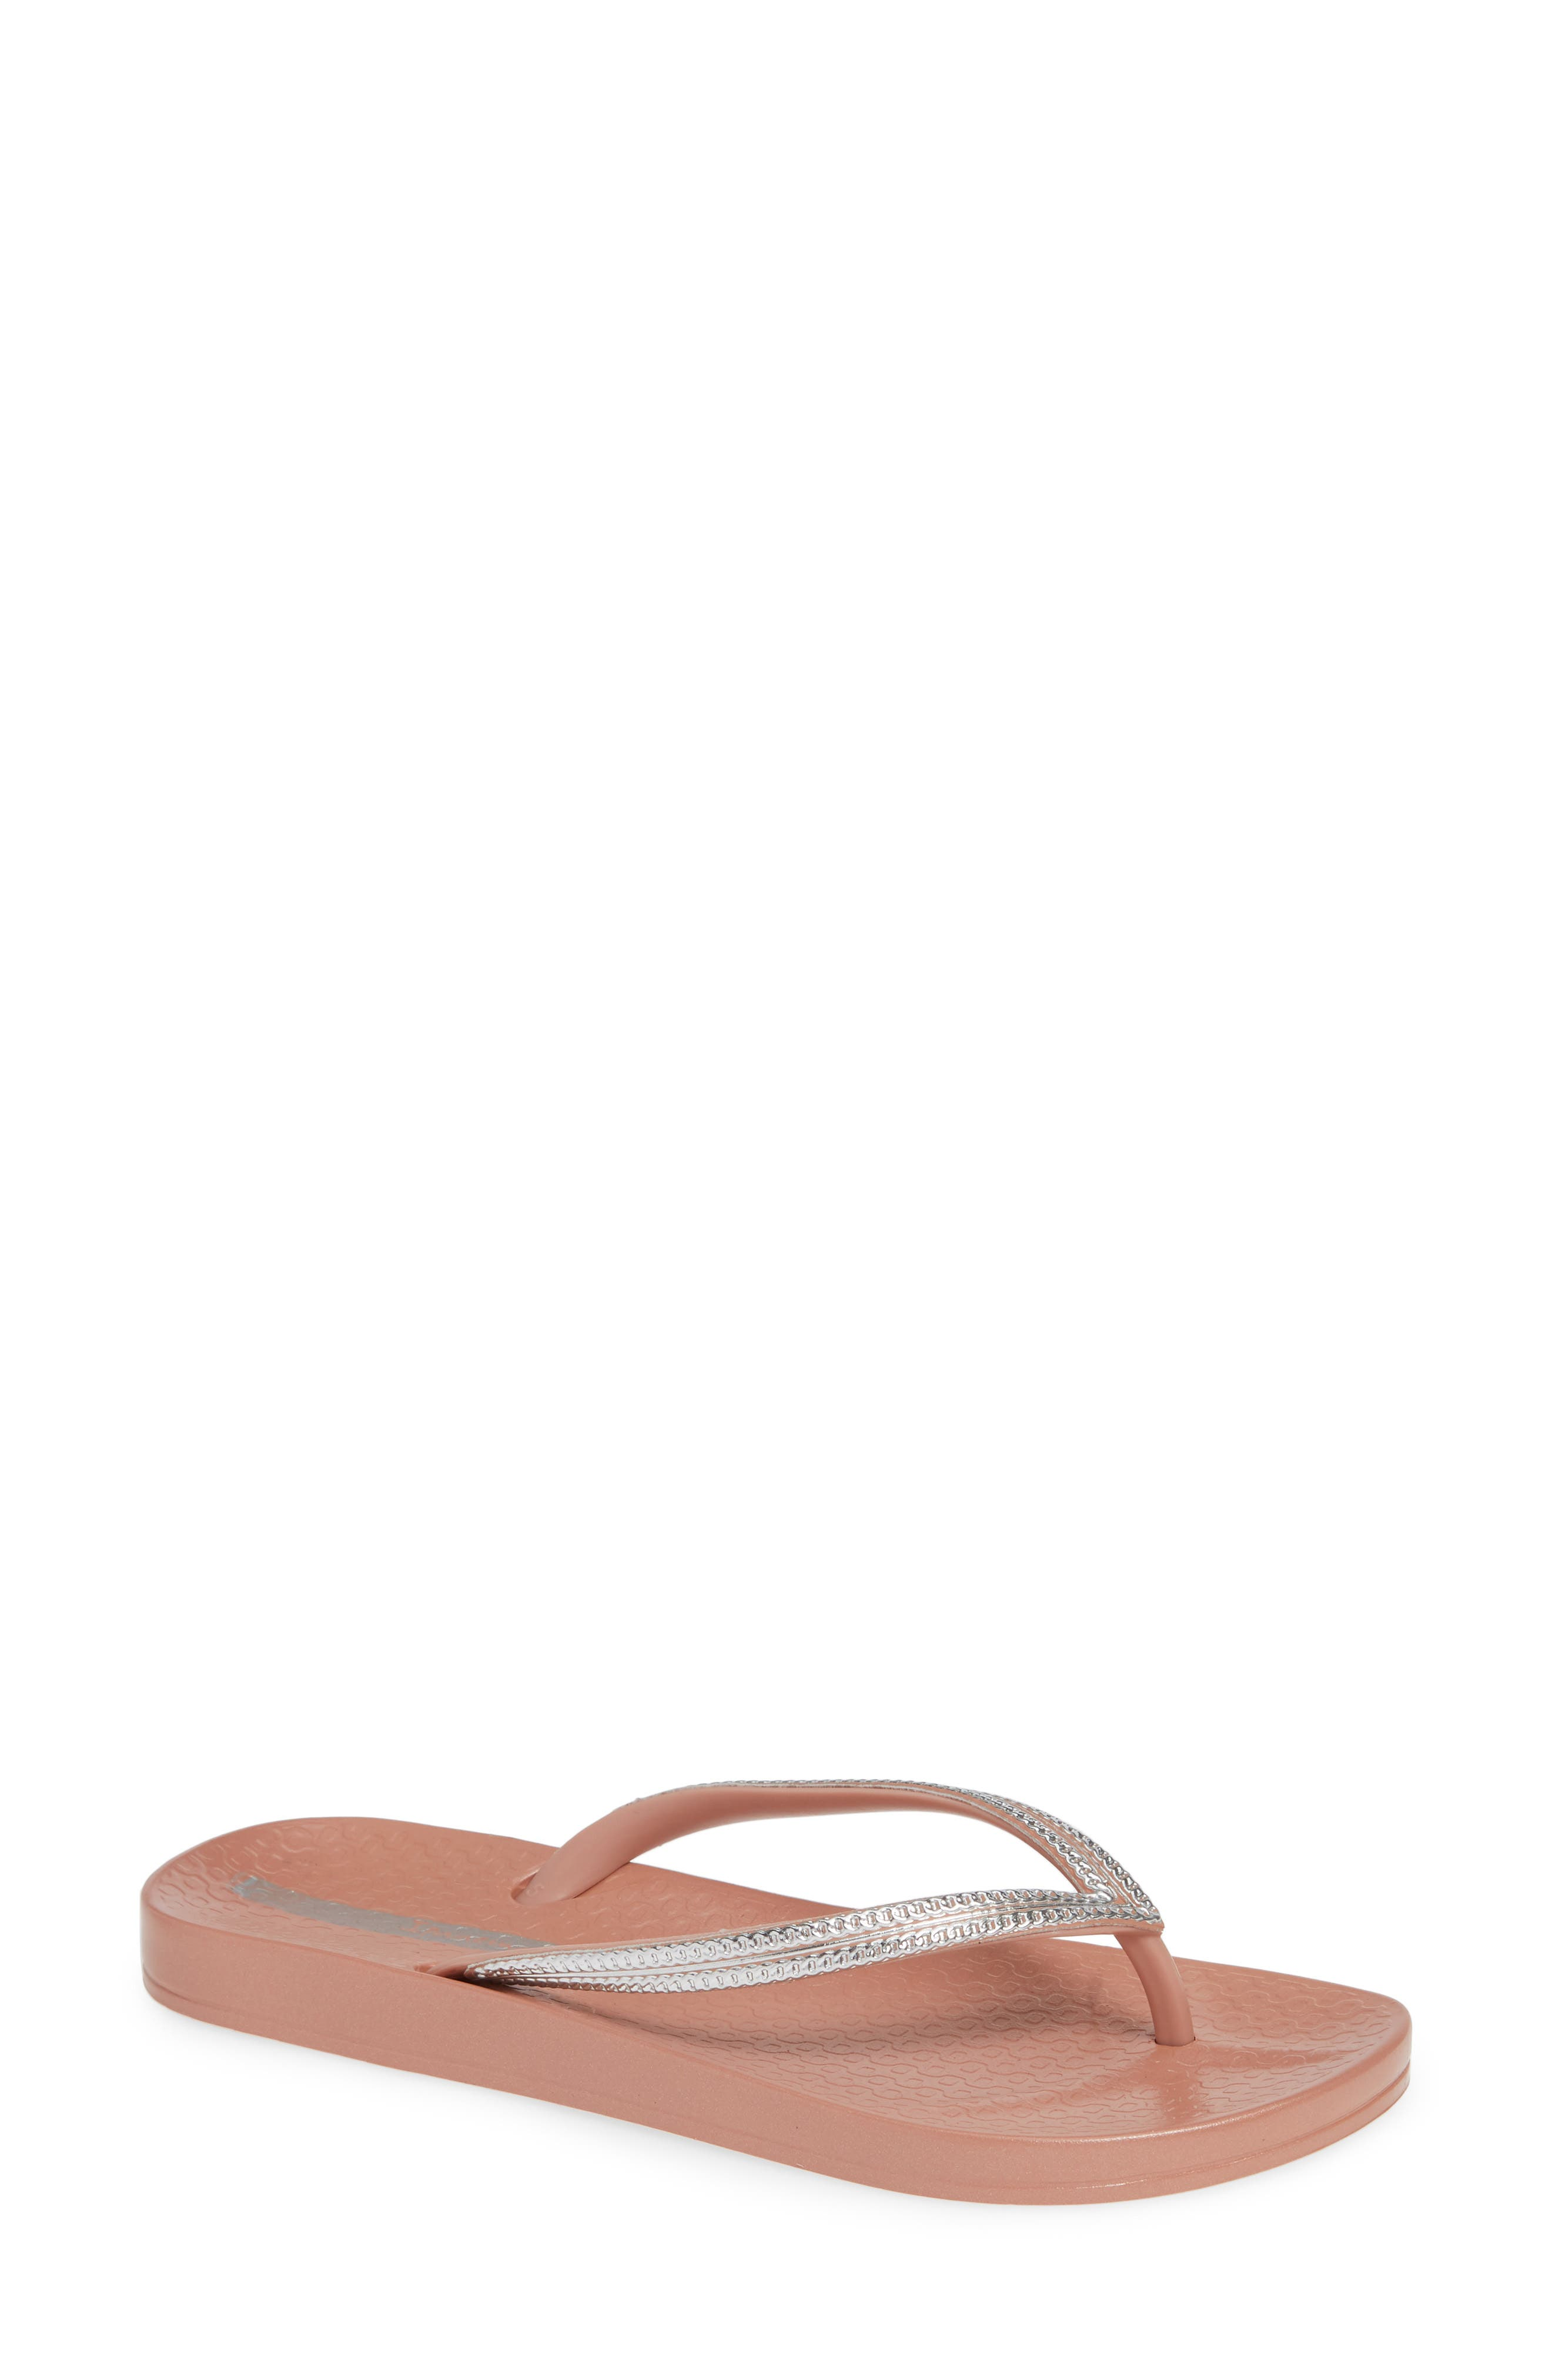 IPANEMA Ana Metallic Flip Flop in Pink/ Silver